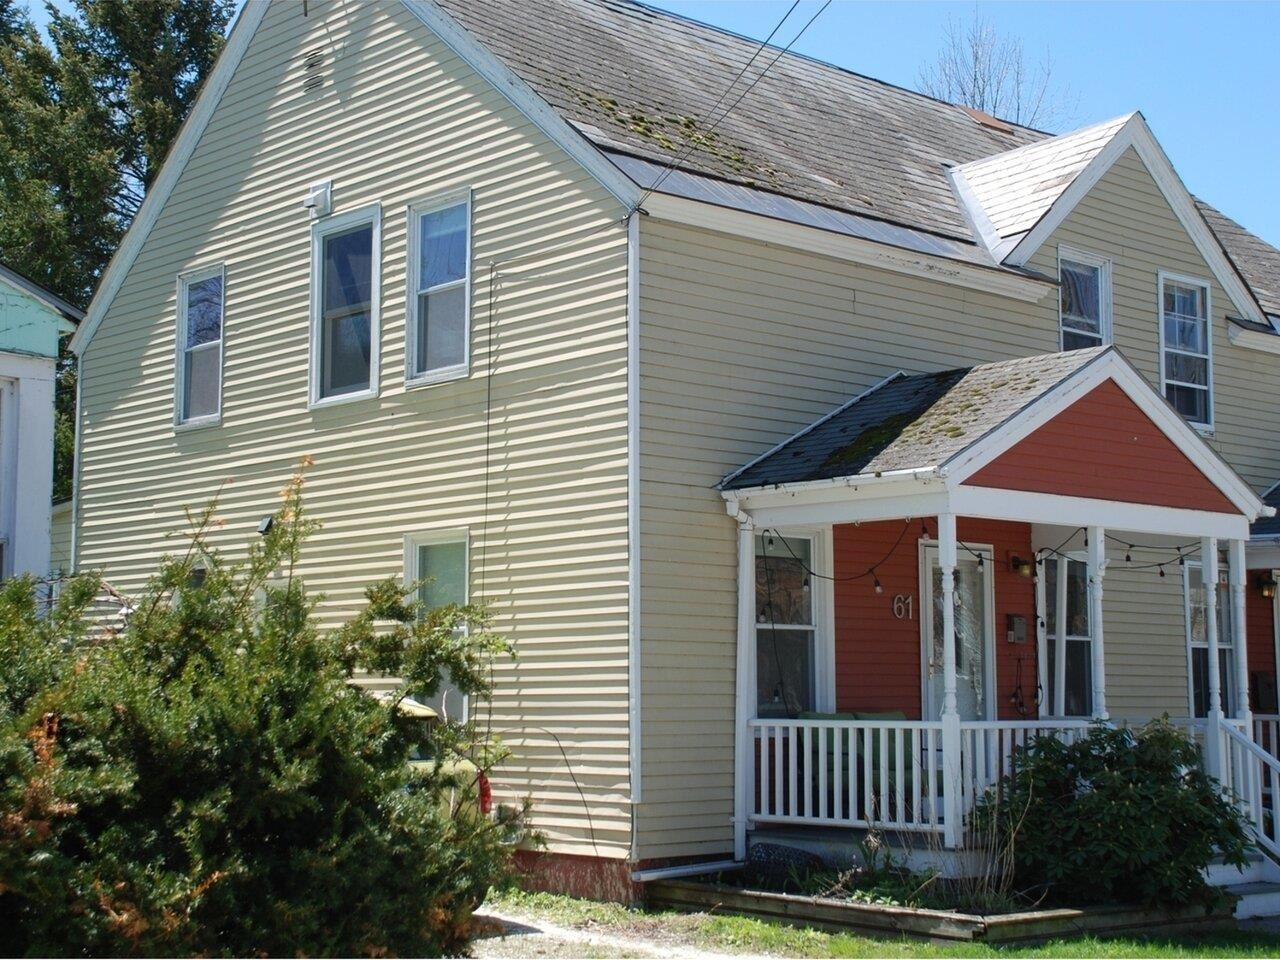 61 Harrison Avenue, Burlington, VT 05401 - MLS#: 4855525